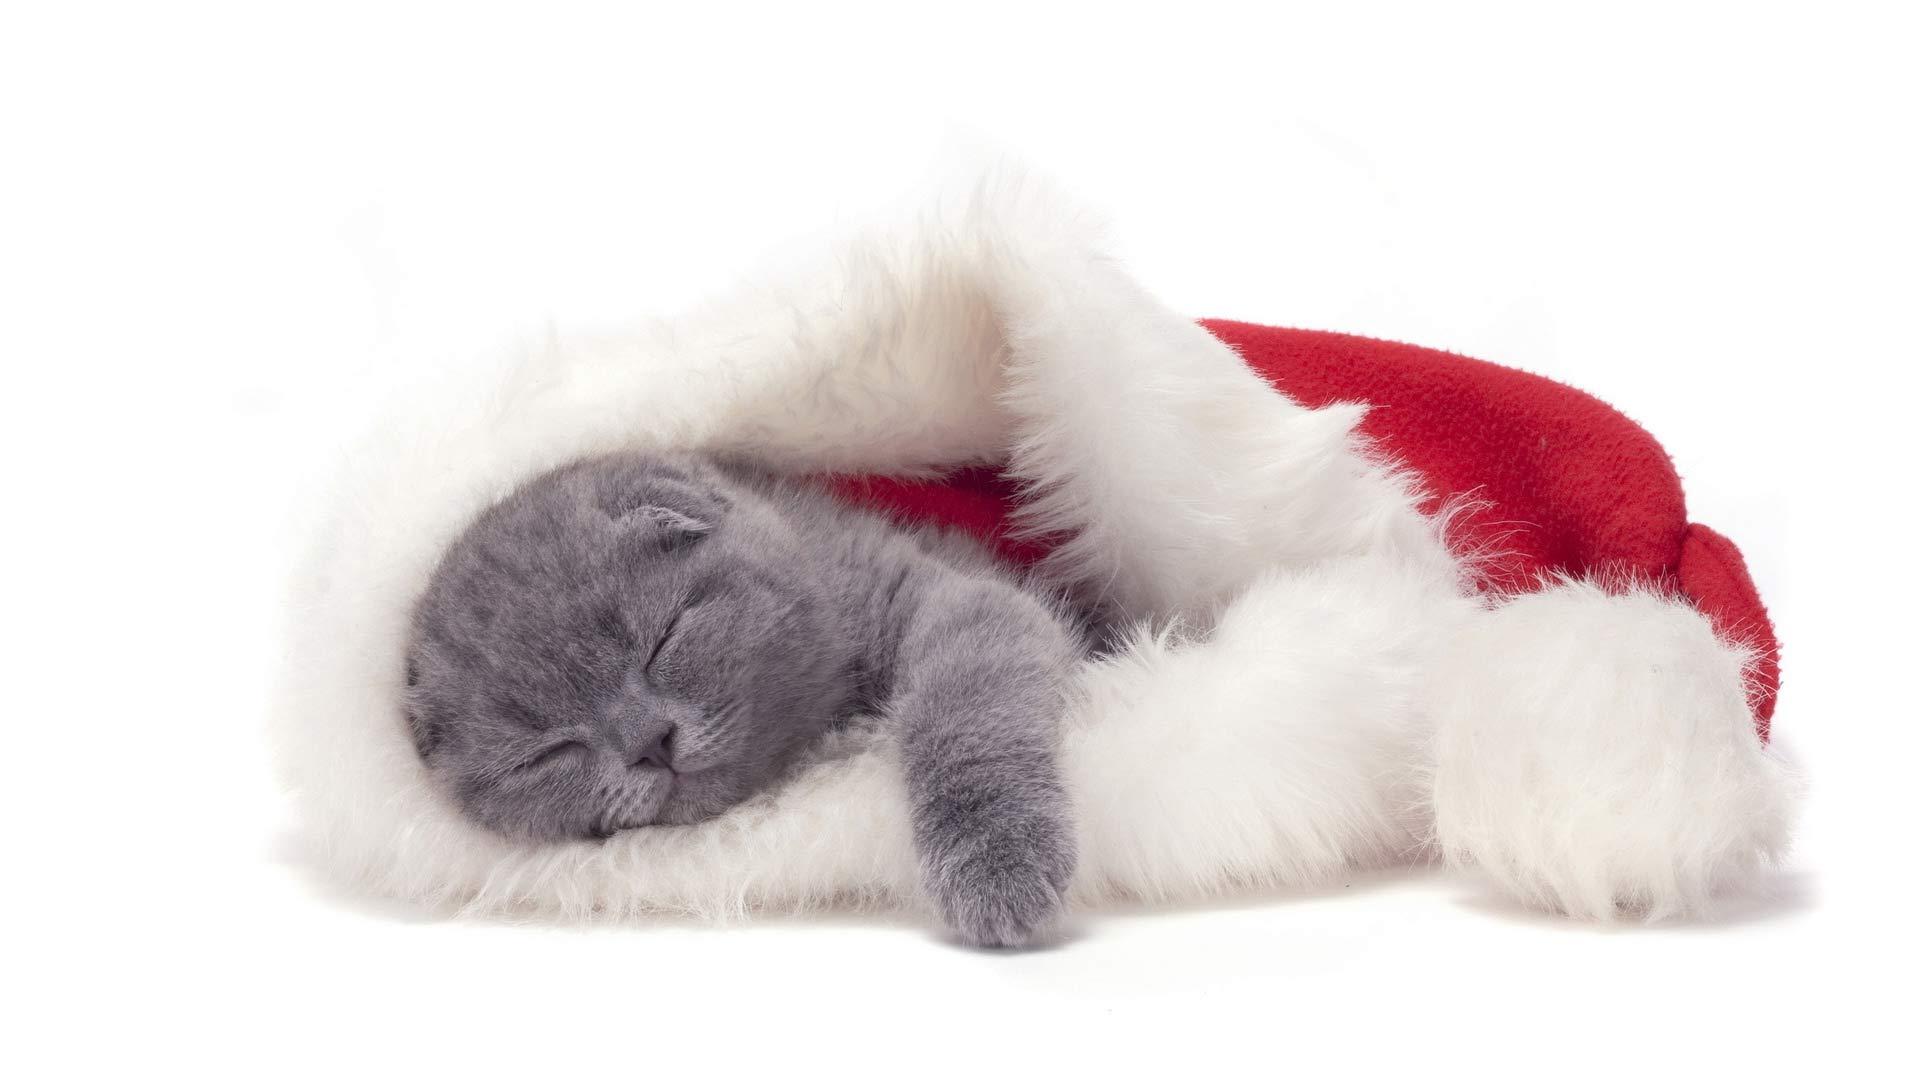 рыжик котик фото